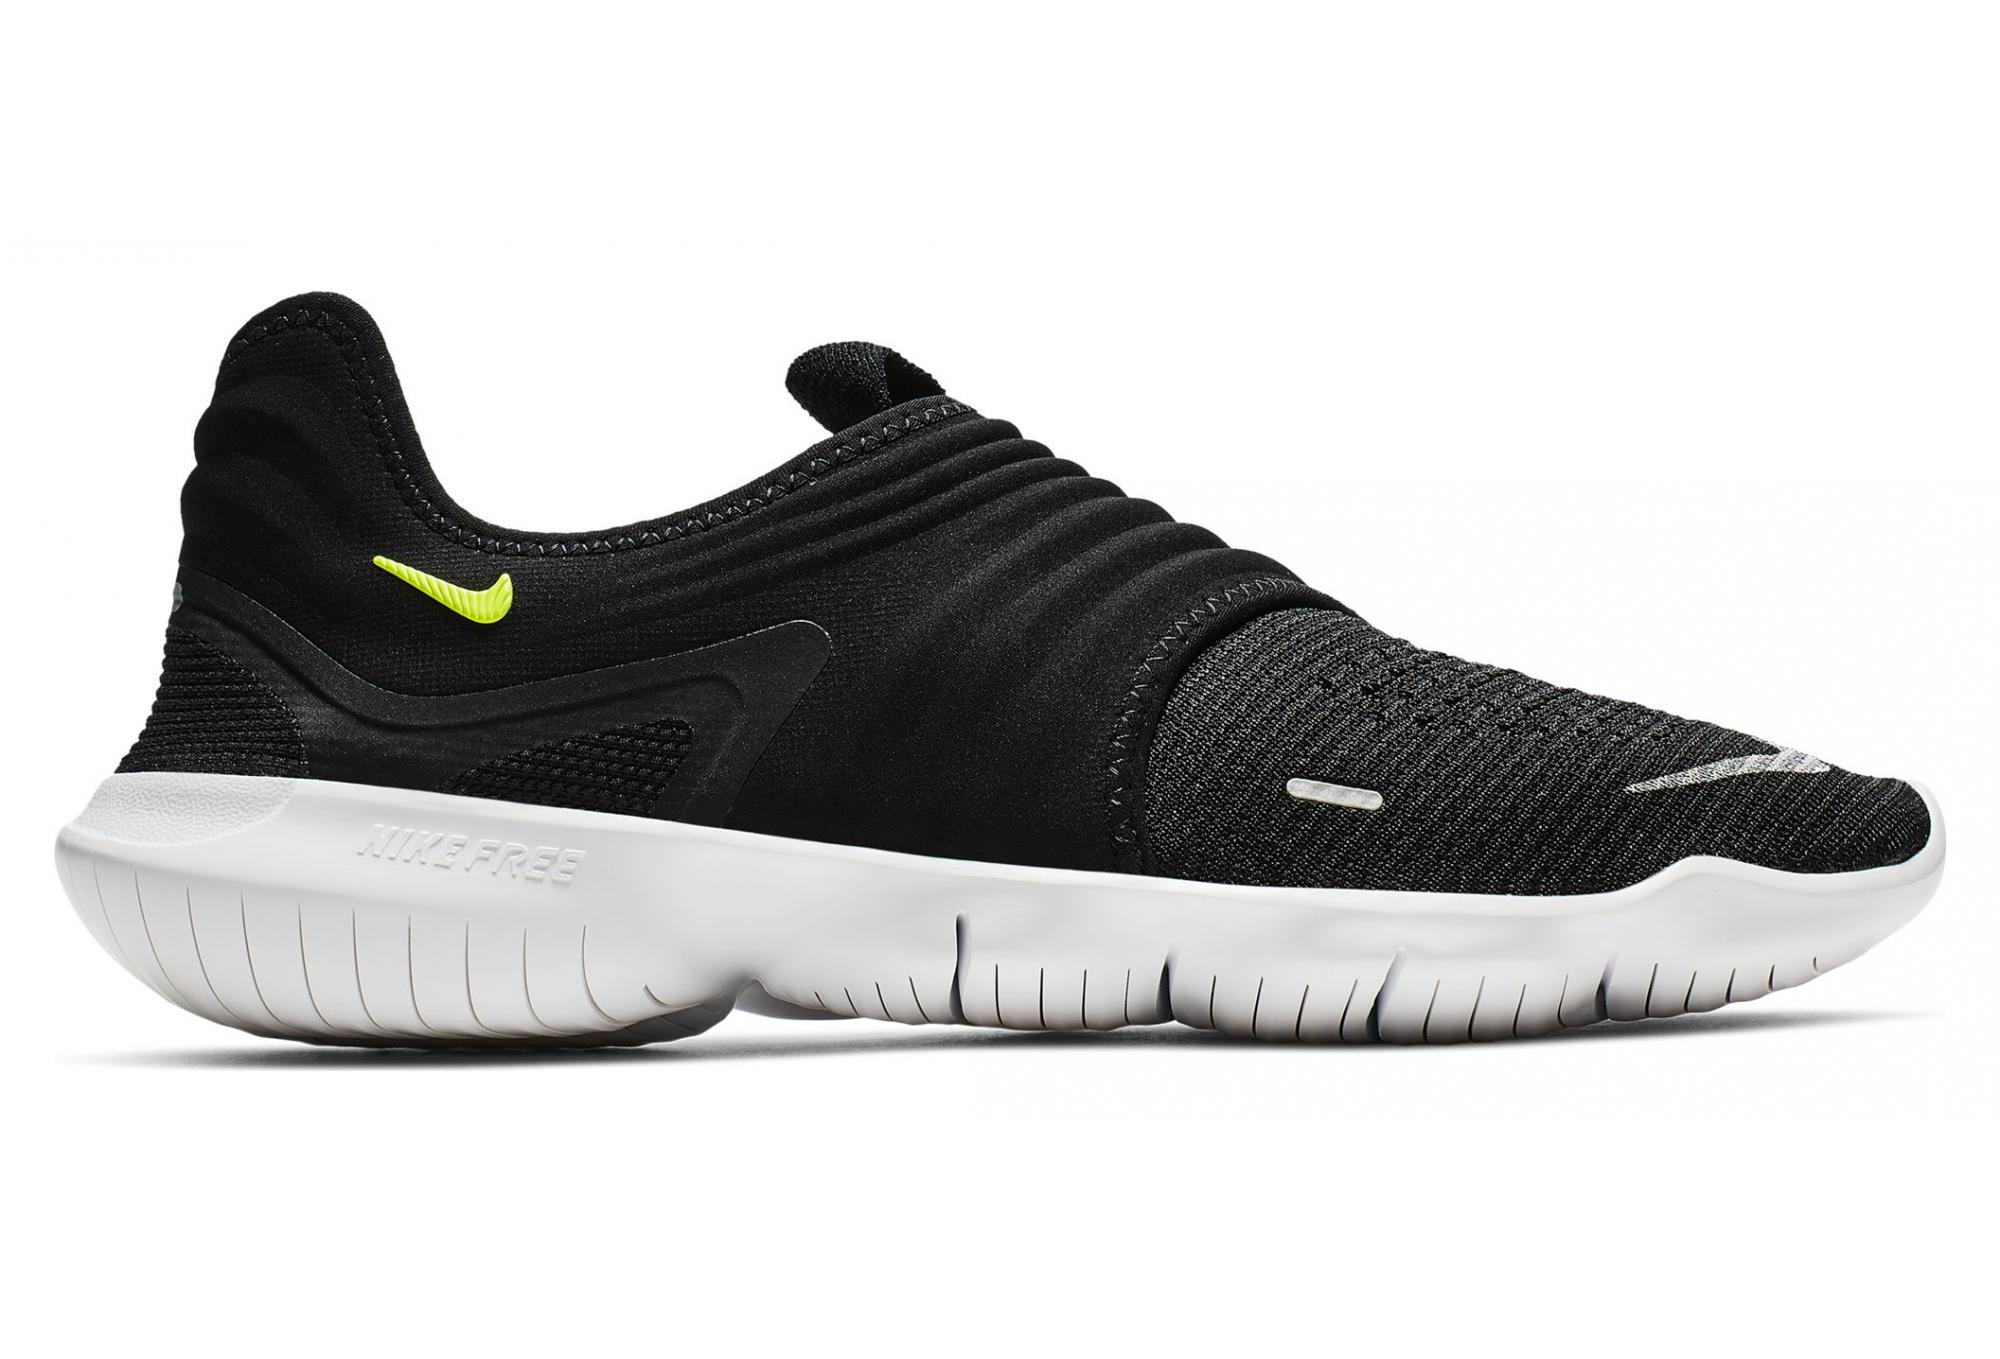 grande vente 9c3e0 a9ceb Nike Free RN Flyknit 3.0 Black White Men